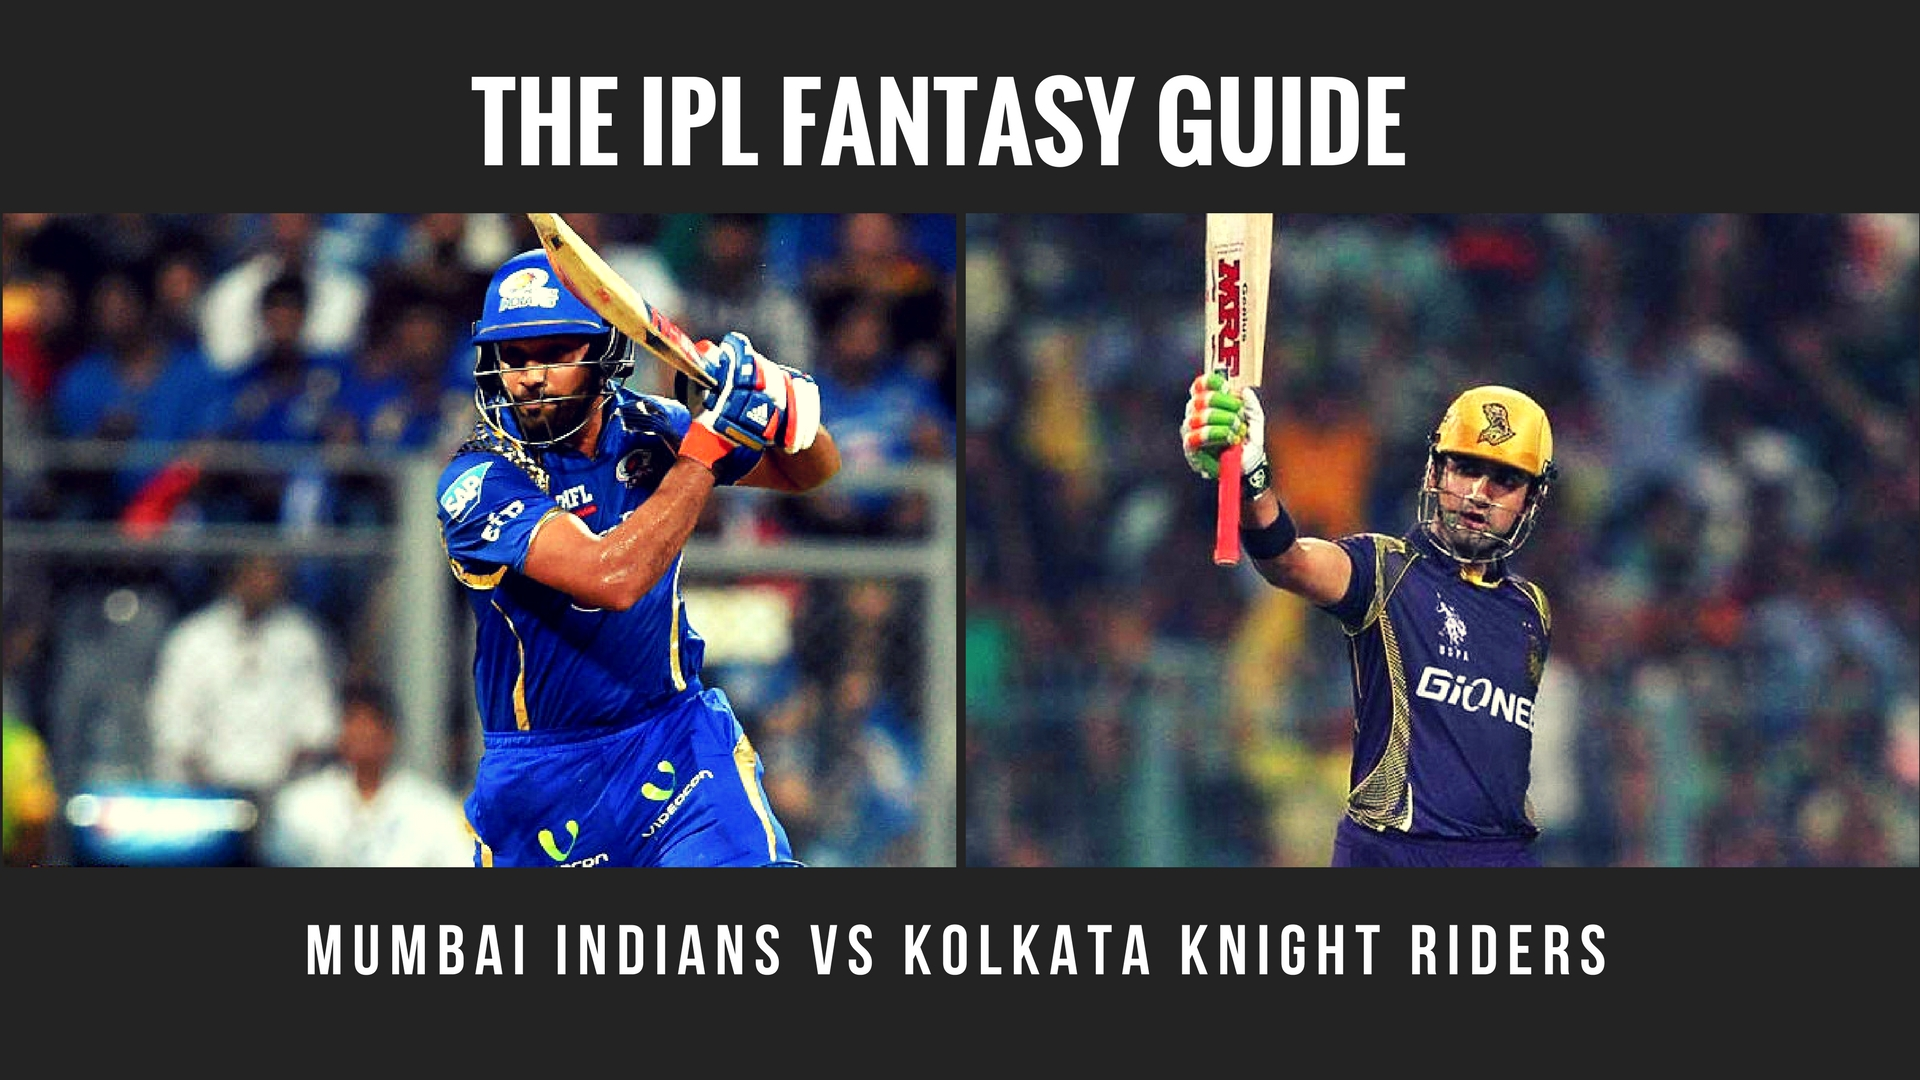 IPL Fantasy tips for Mumbai Indians vs Kolkata Knight Riders